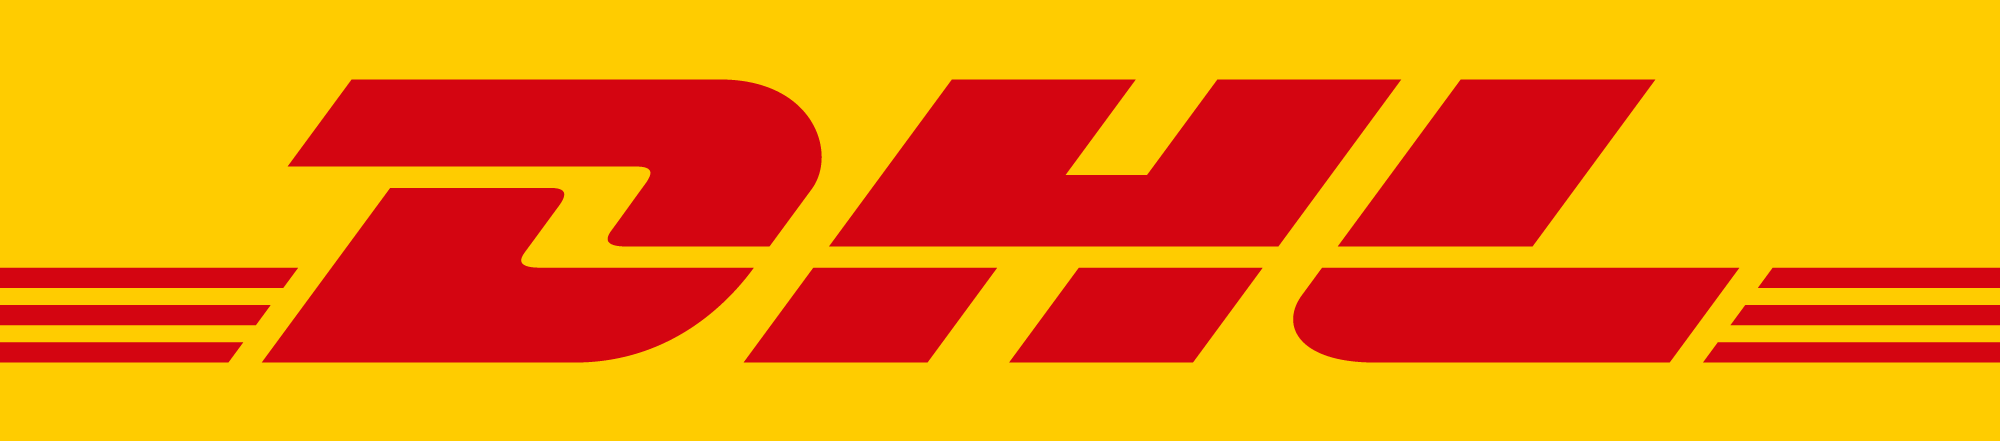 DHL Versand Logo